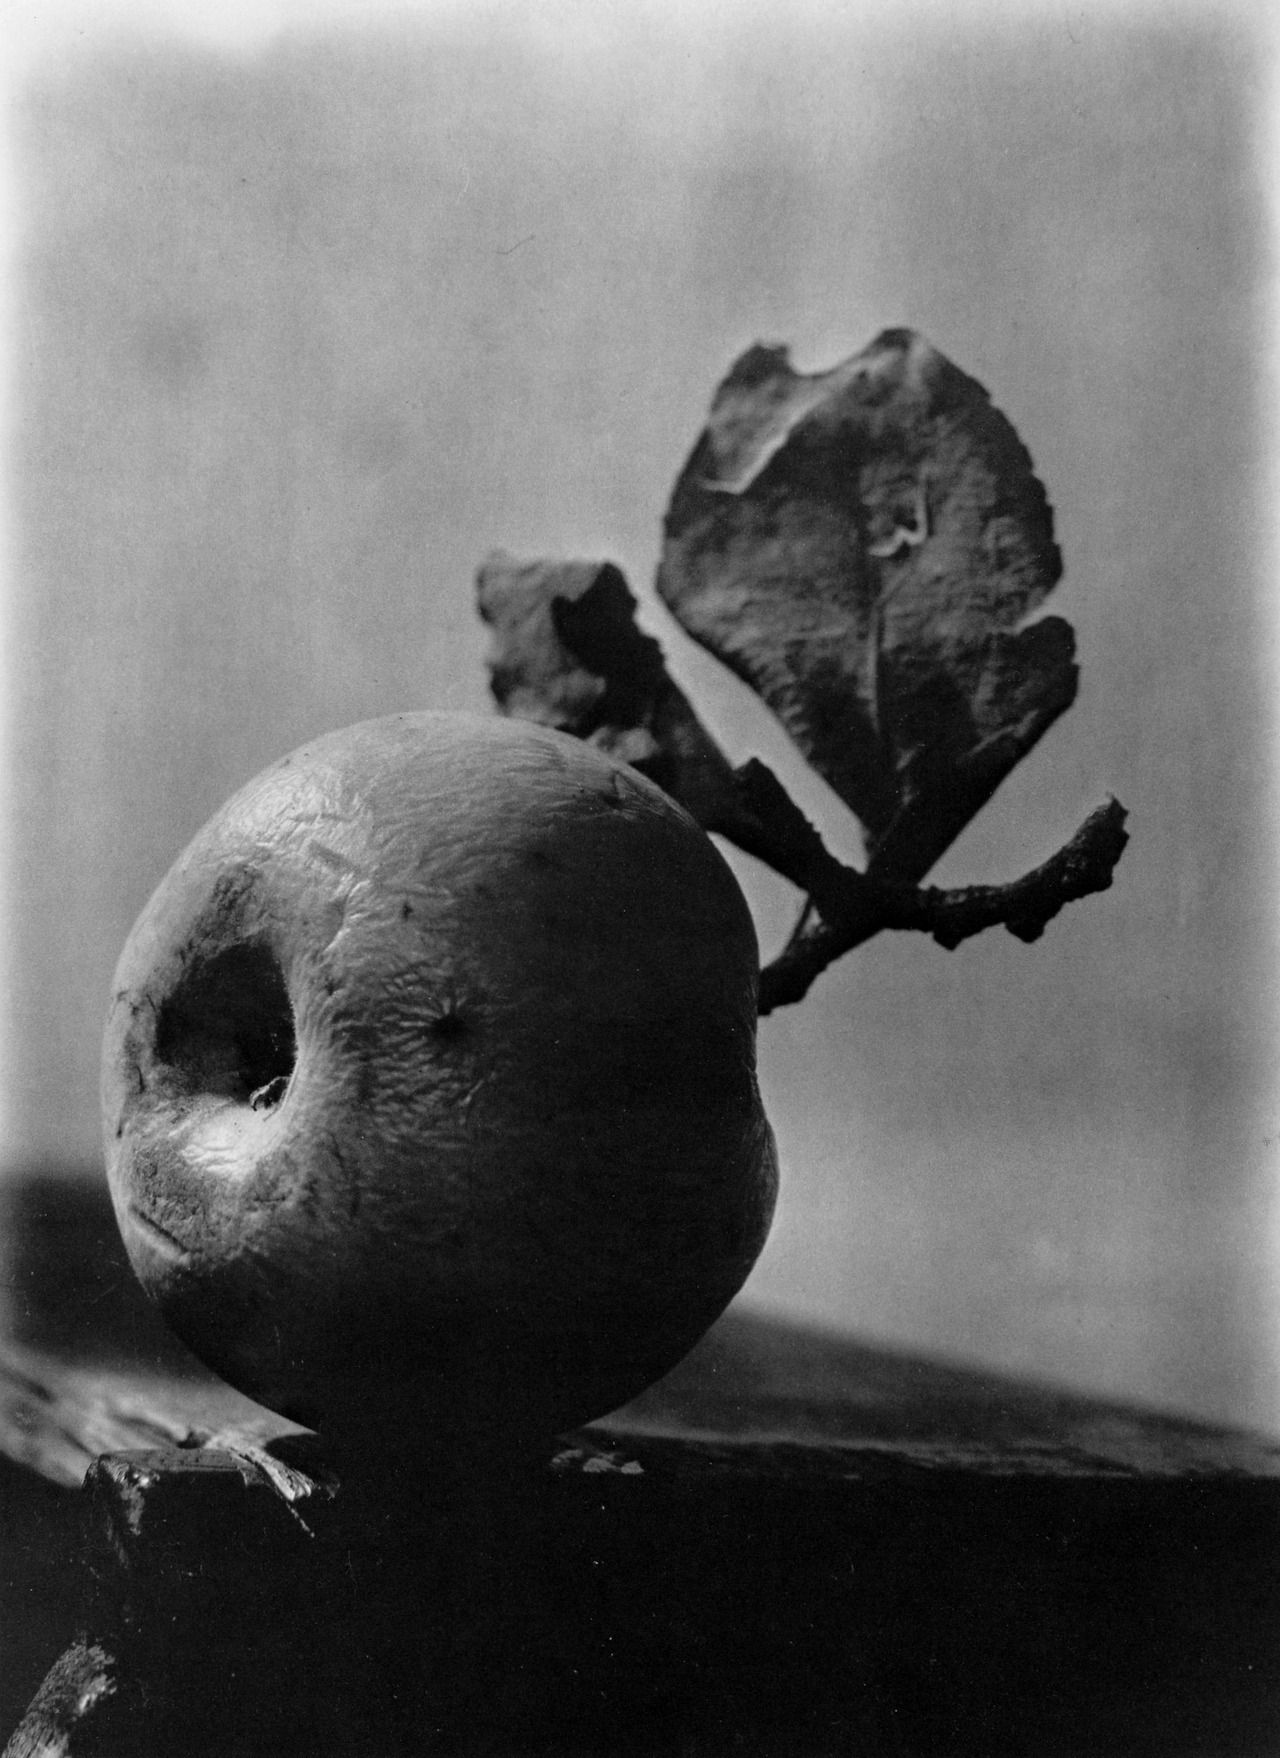 Black and white photography labrancaro josef sudek